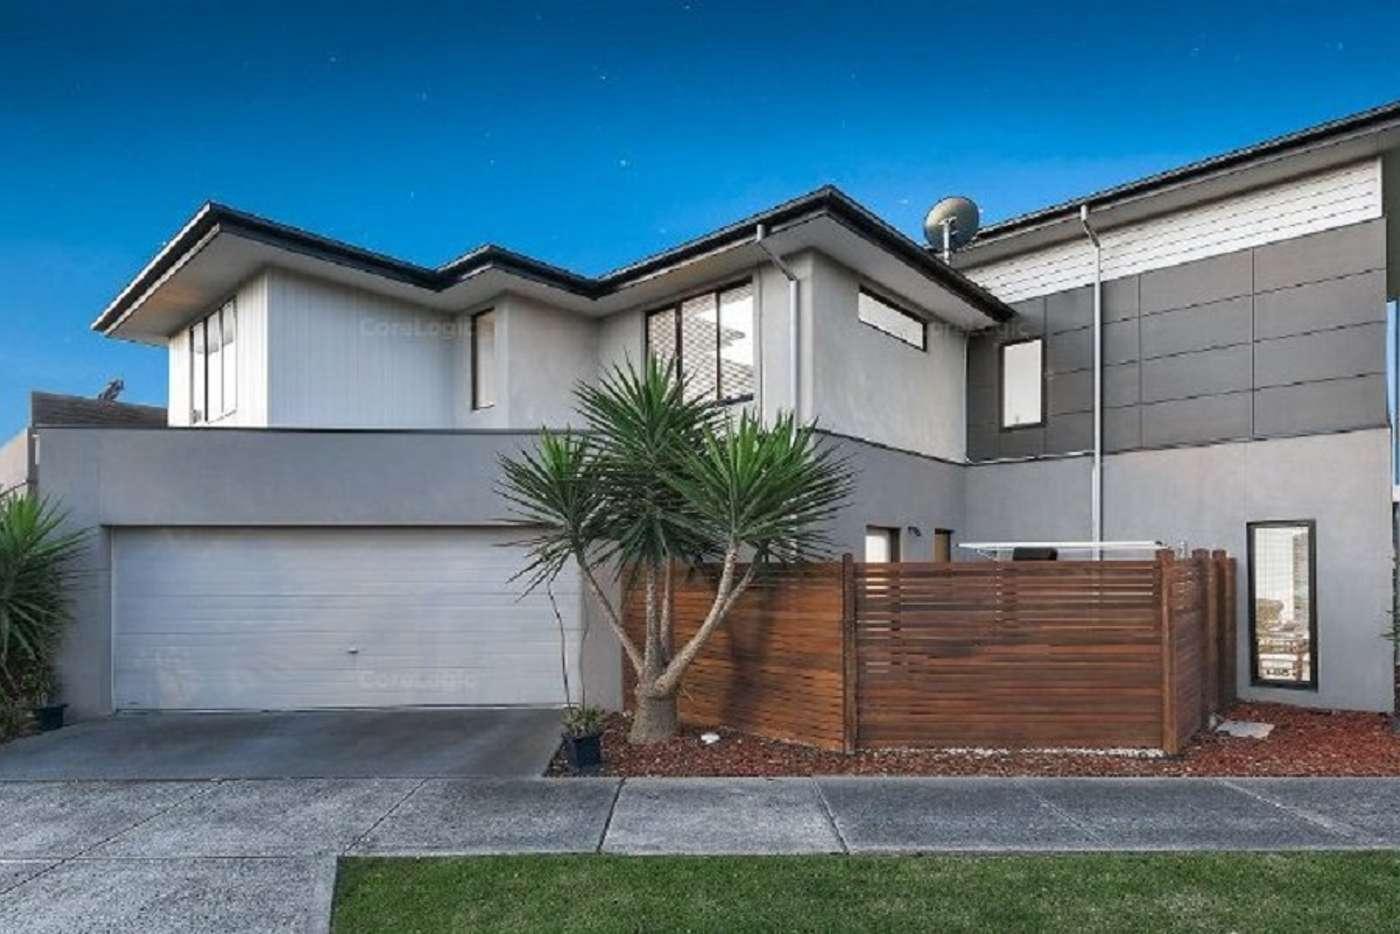 Main view of Homely house listing, 9 Keylana Drive, Keysborough VIC 3173